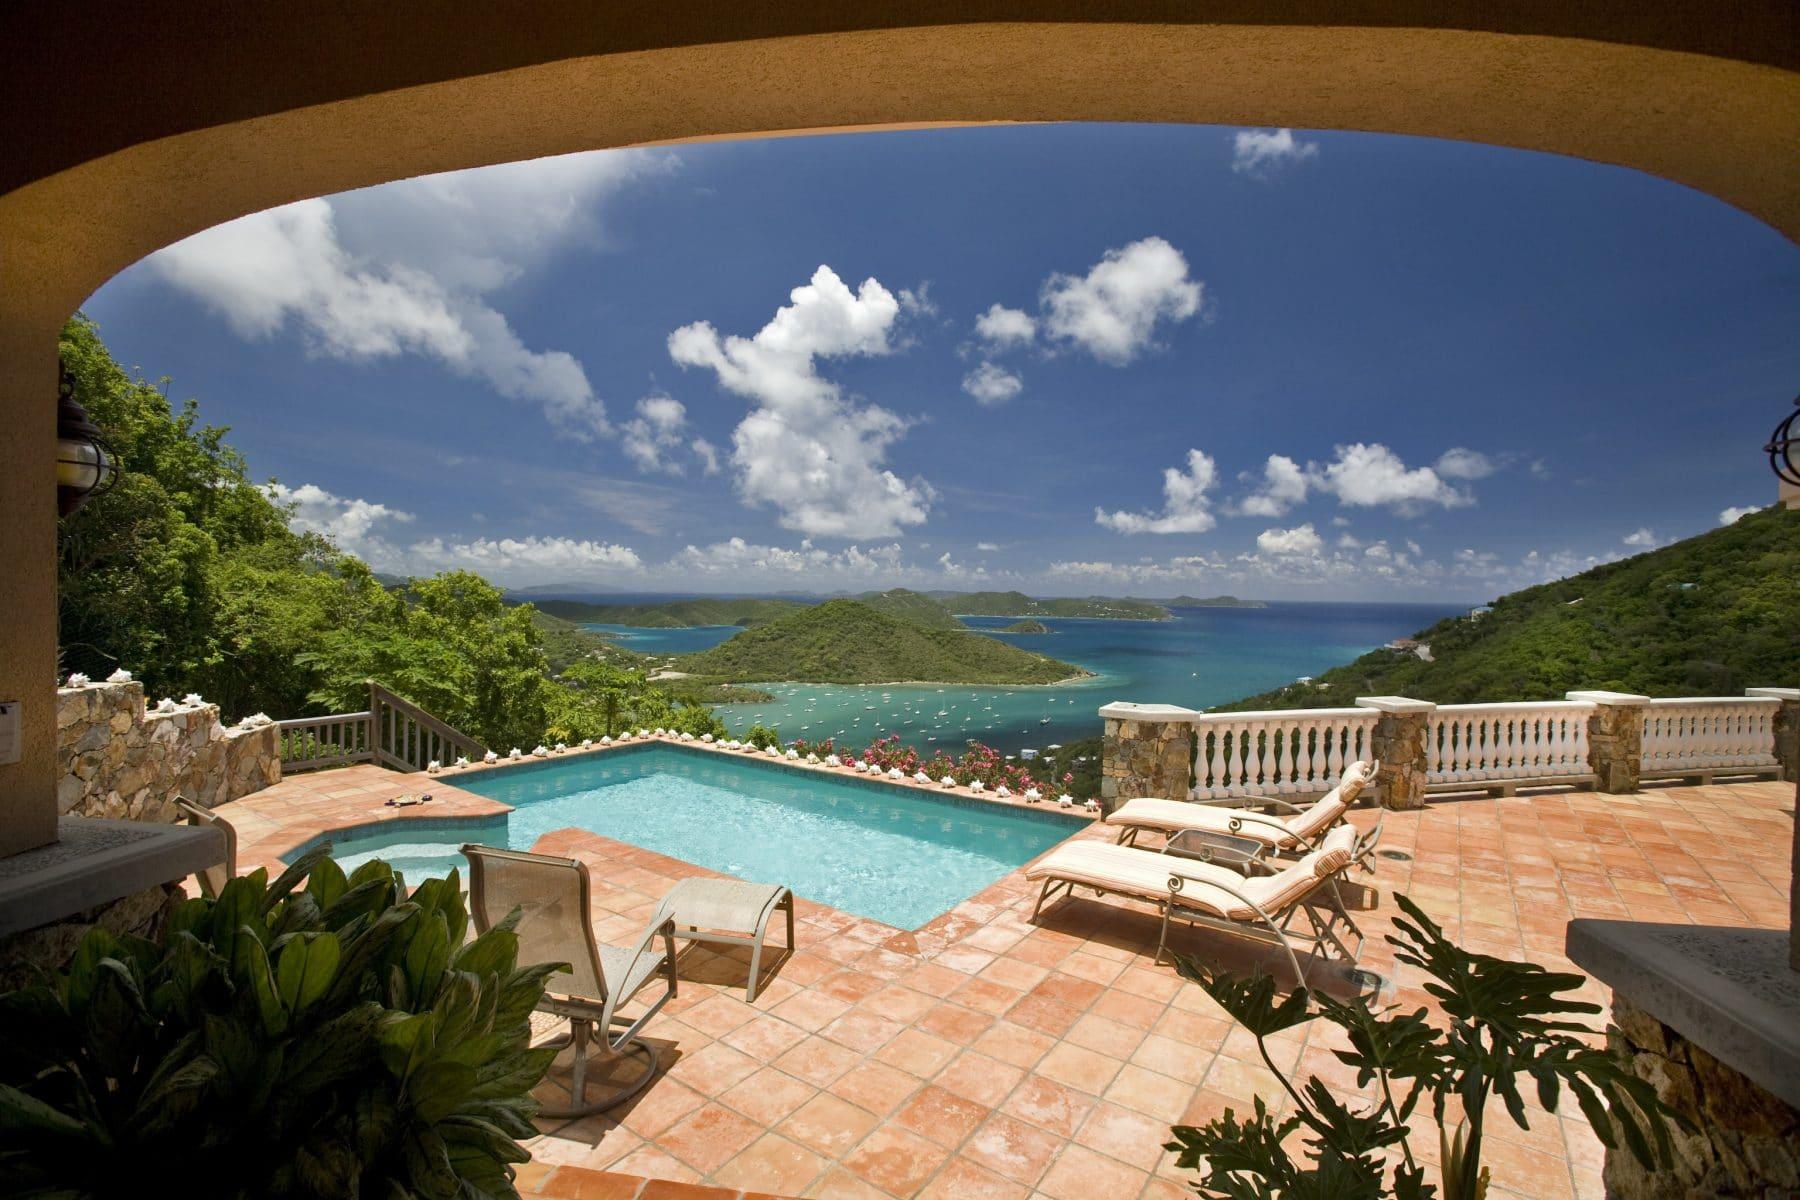 virgin islands vacation rentals PalladiosViews